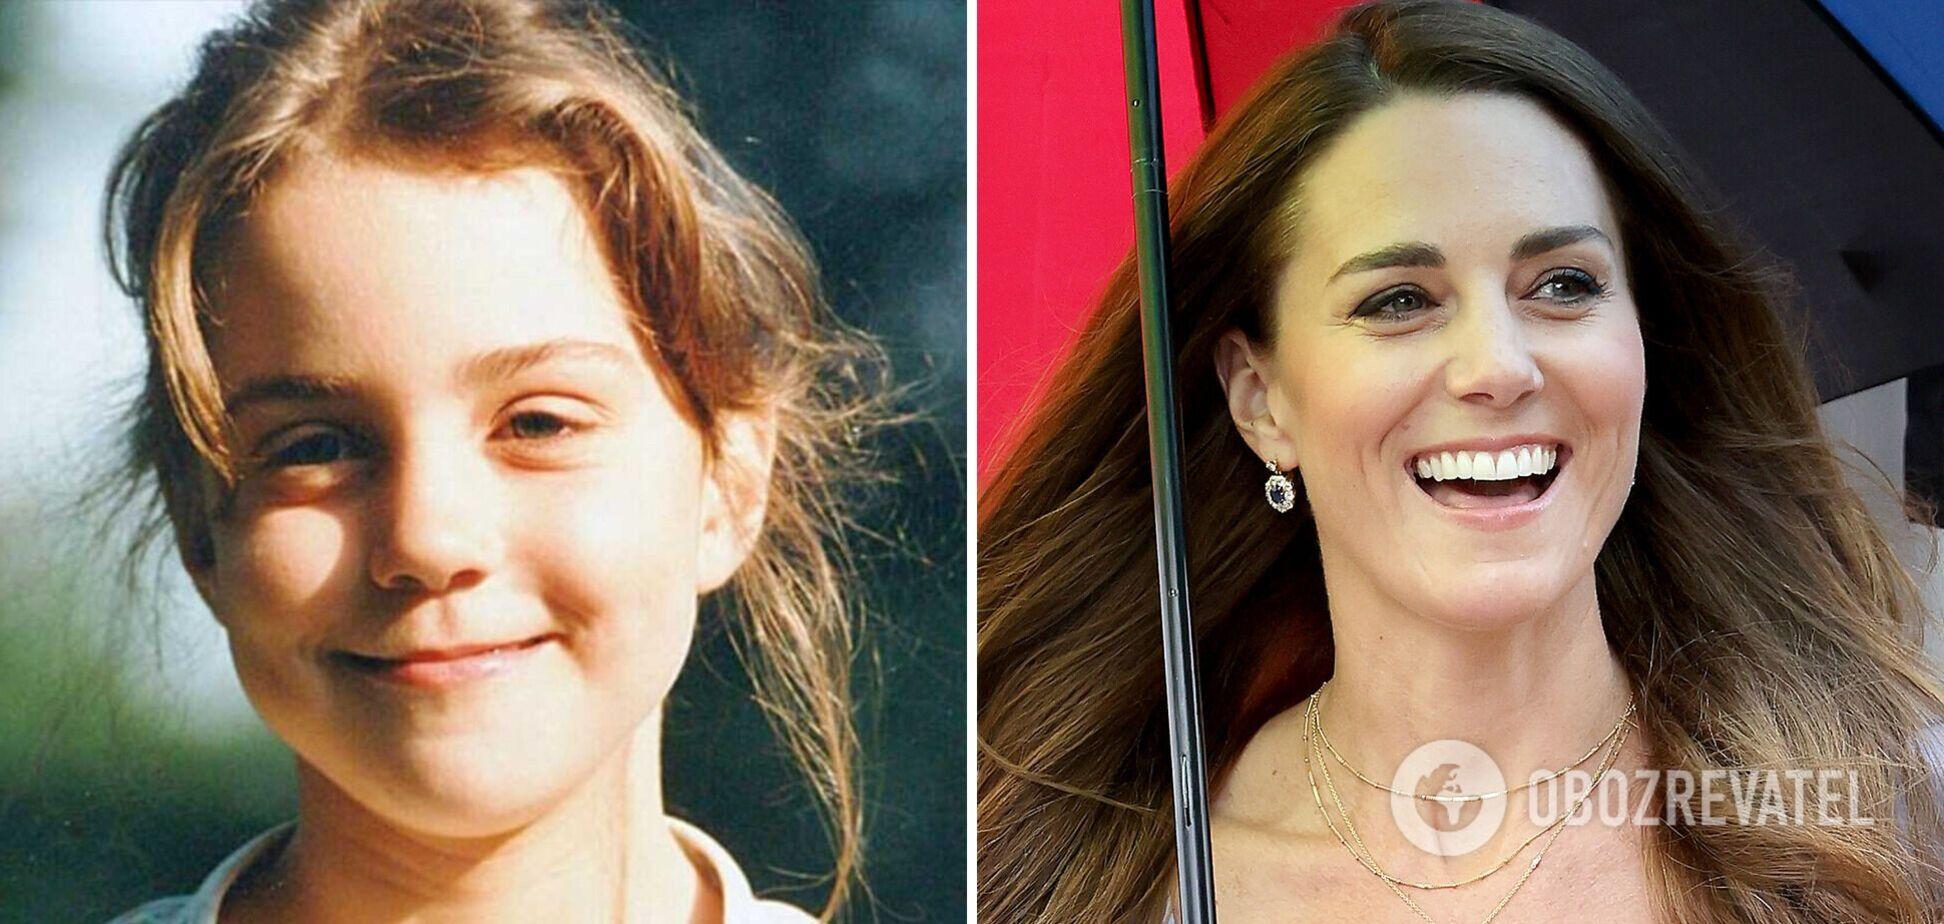 Как менялась Кейт Миддлтон: фото герцогини на протяжении жизни